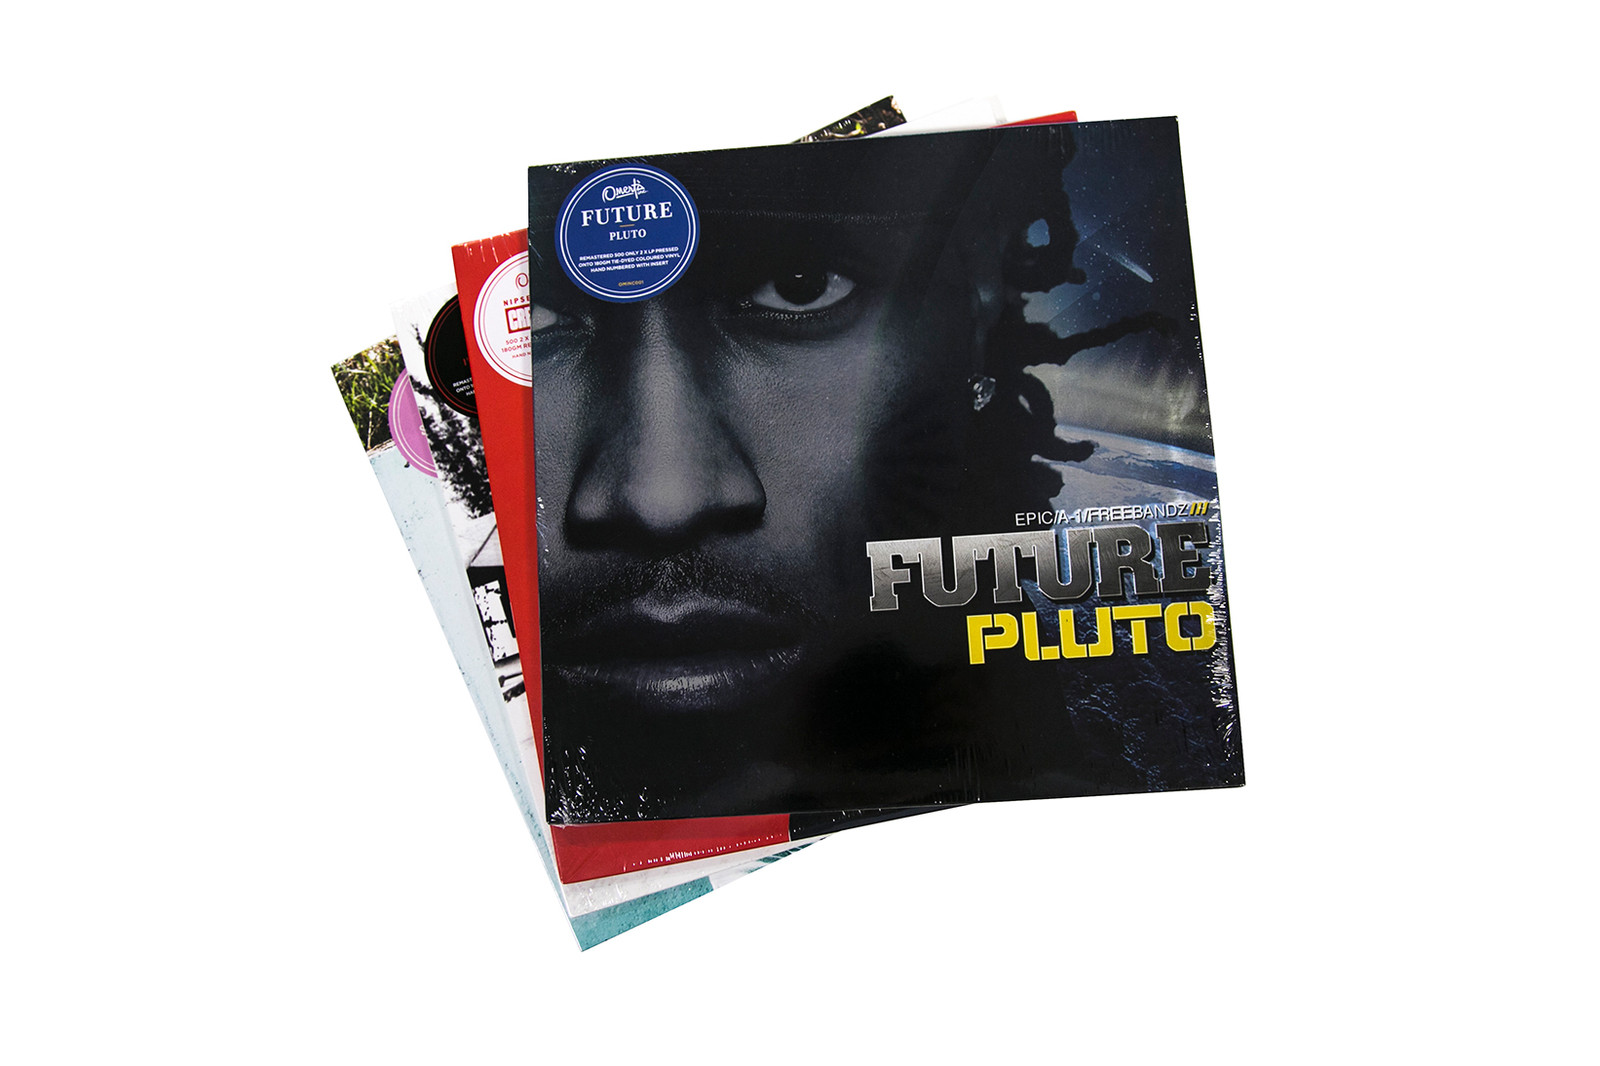 Omertà Inc. Hip Hop Mixtapes Vinyl Gucci Mane Cousin Stizz Future Kendrick Lamar Outkast Big Daddy Kane Thouxan